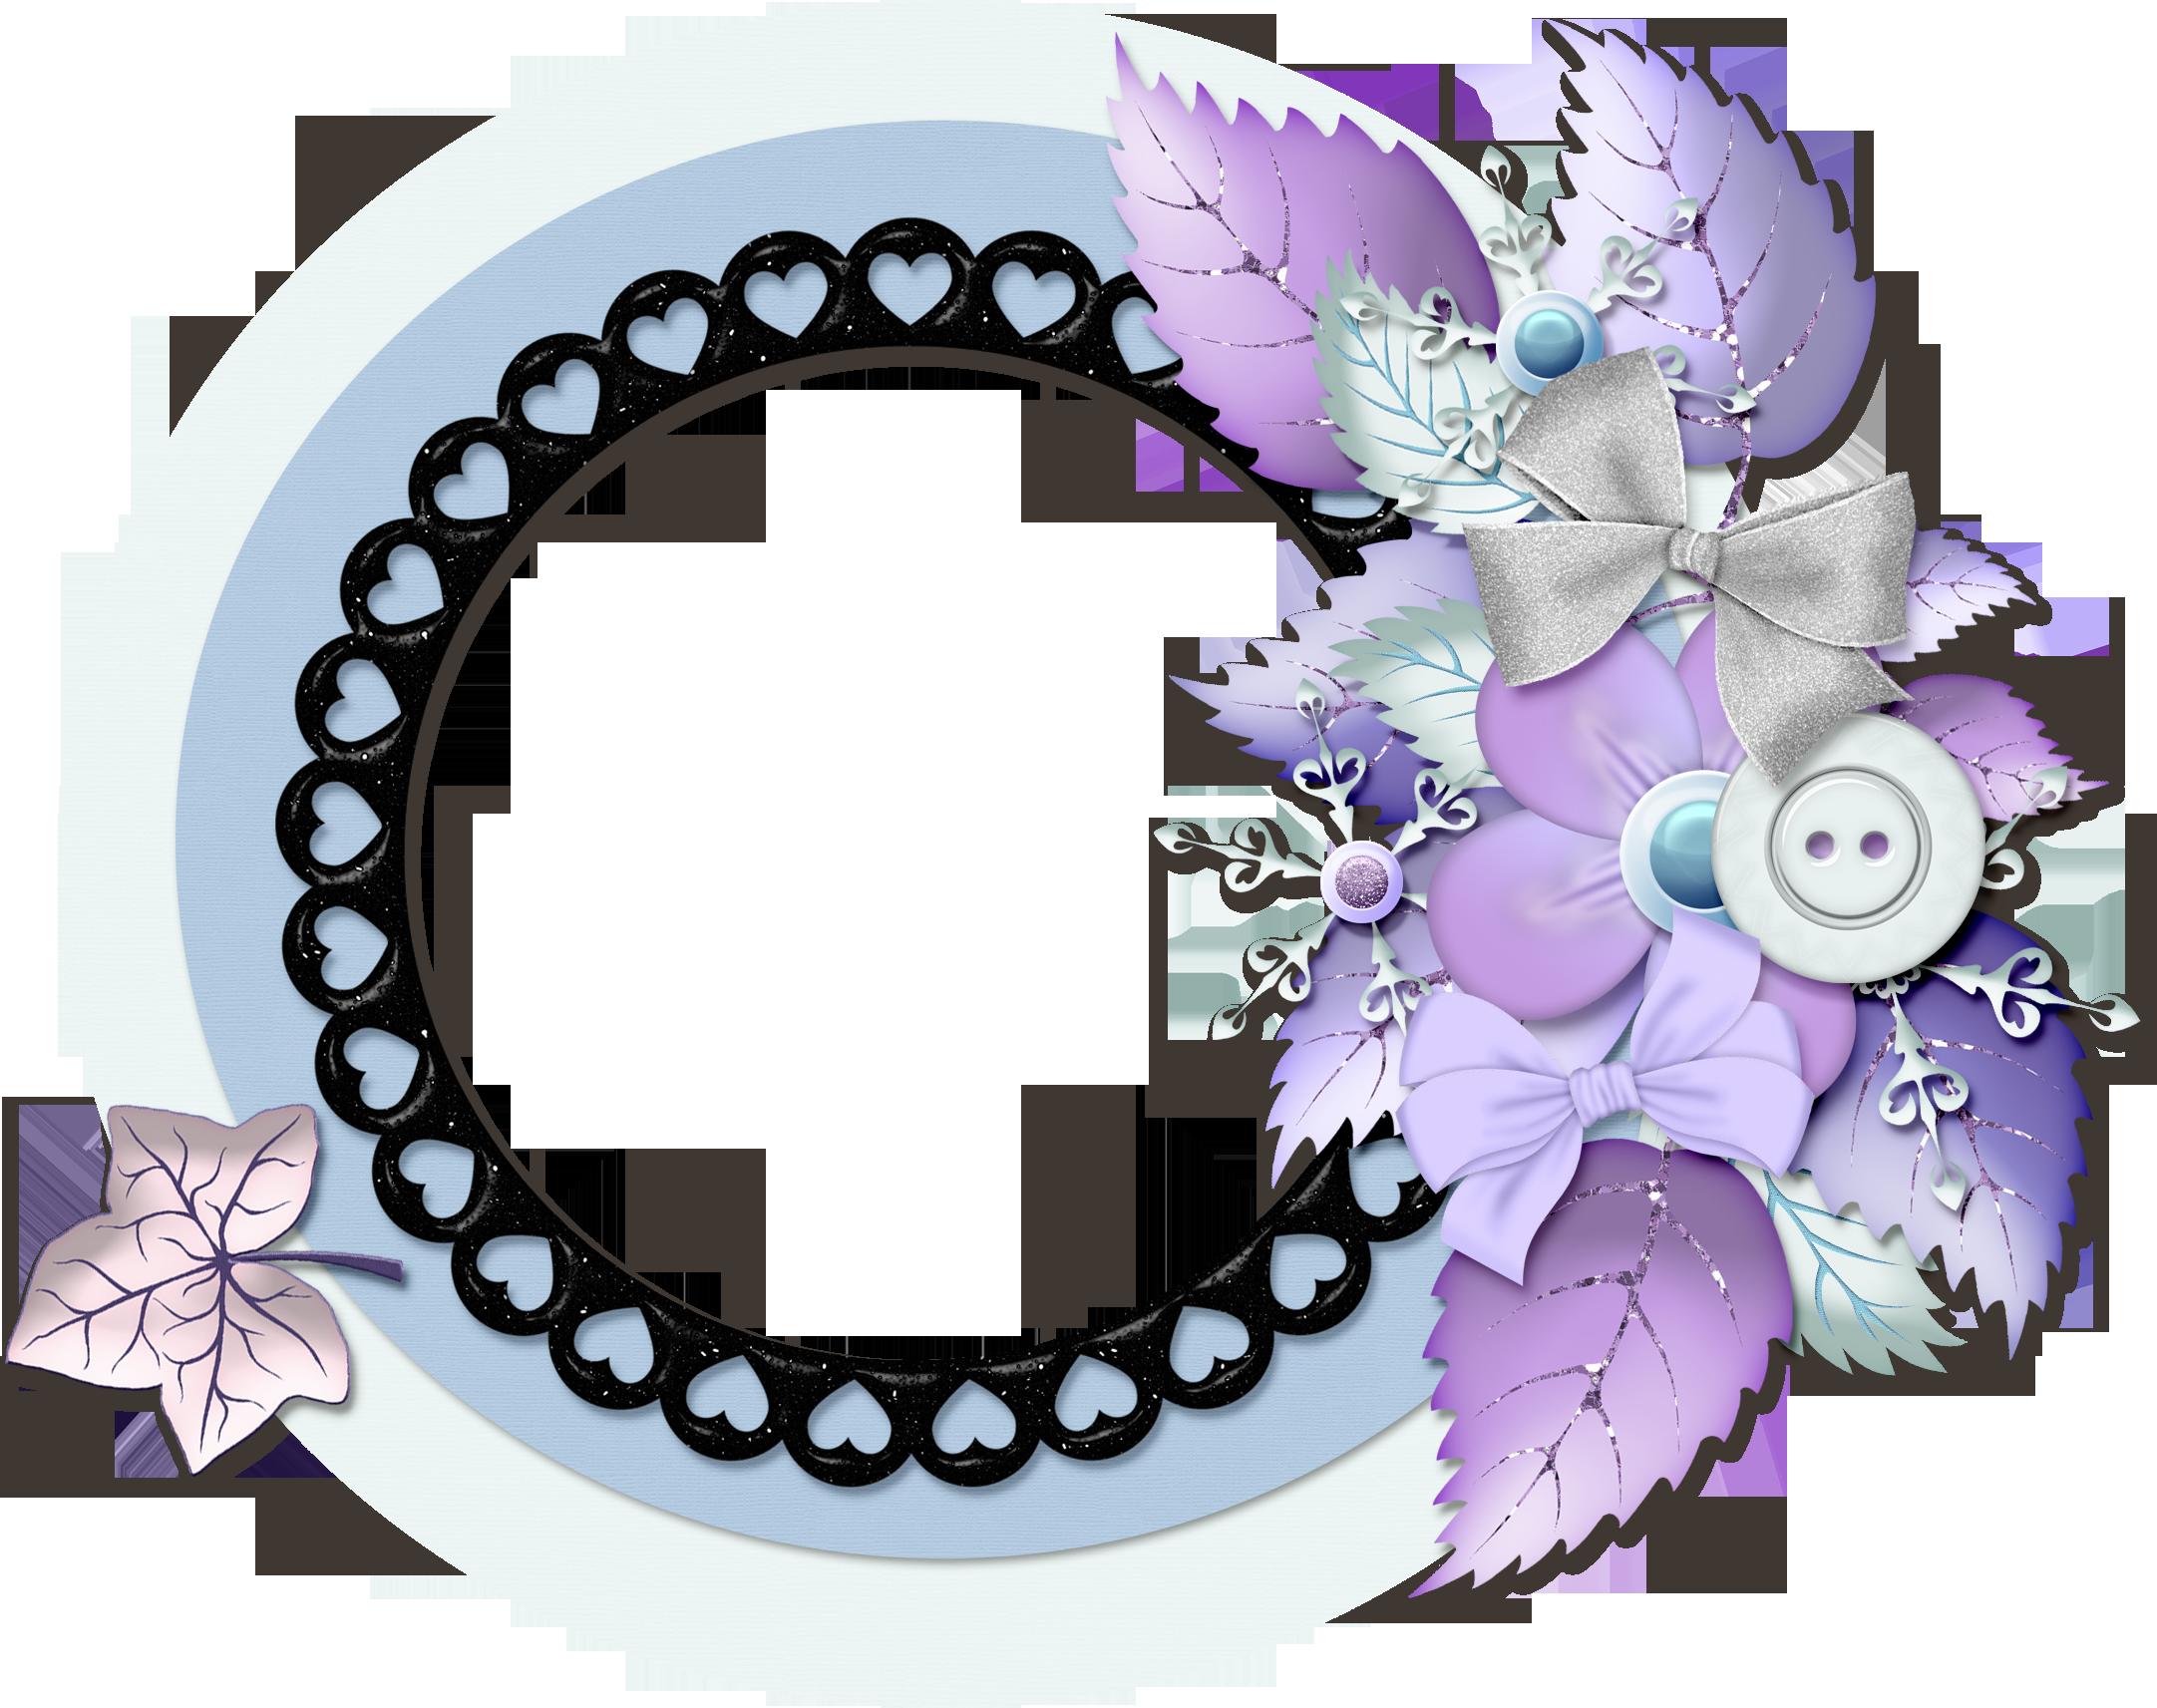 Free to use thanksgiving psp clipart png free Pin by Cheryl Lynn Kiebler on PSP Frames | Pinterest | Psp png free